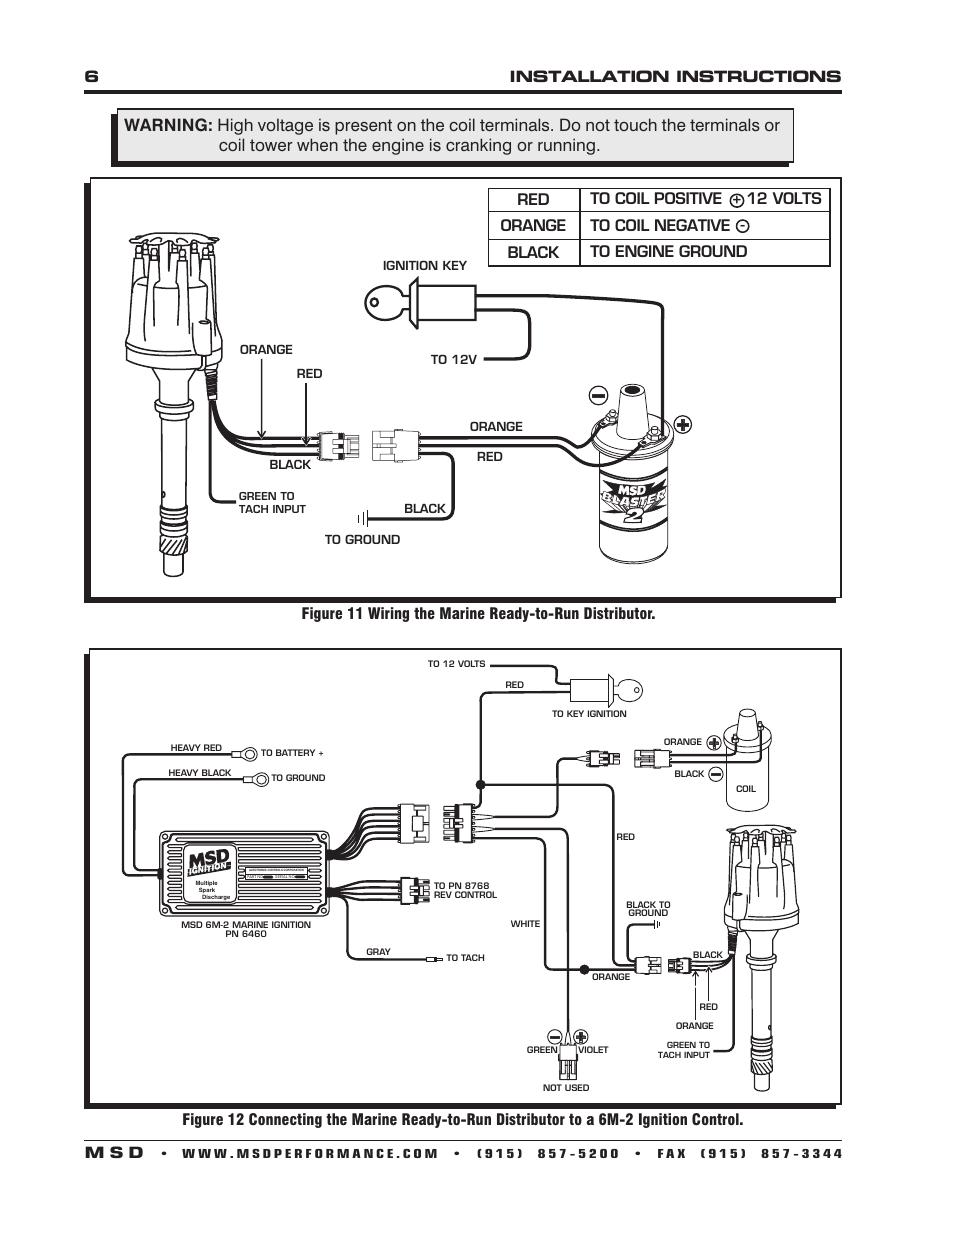 msd ready to run wiring diagram wiring diagram  ford 460 msd 7al wiring diagram #4